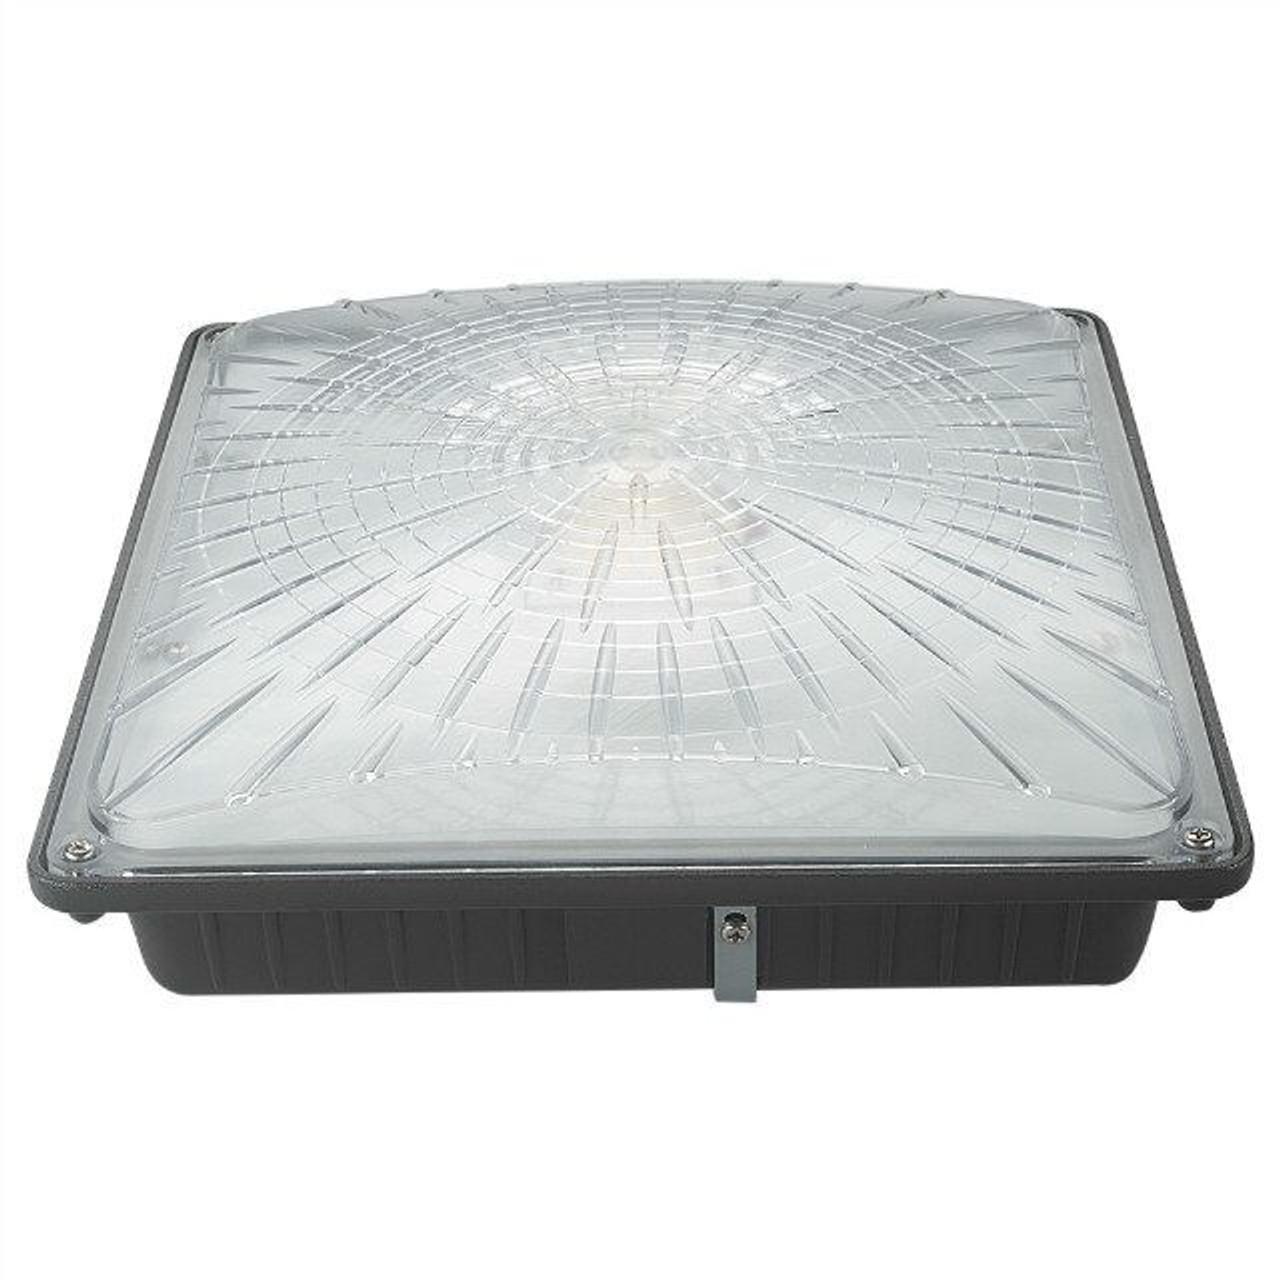 Slim Line Canopy LED Light 40 Watt, 5000 lumen, 5000 Kelvin, 100-277 volt UL DLC Listed